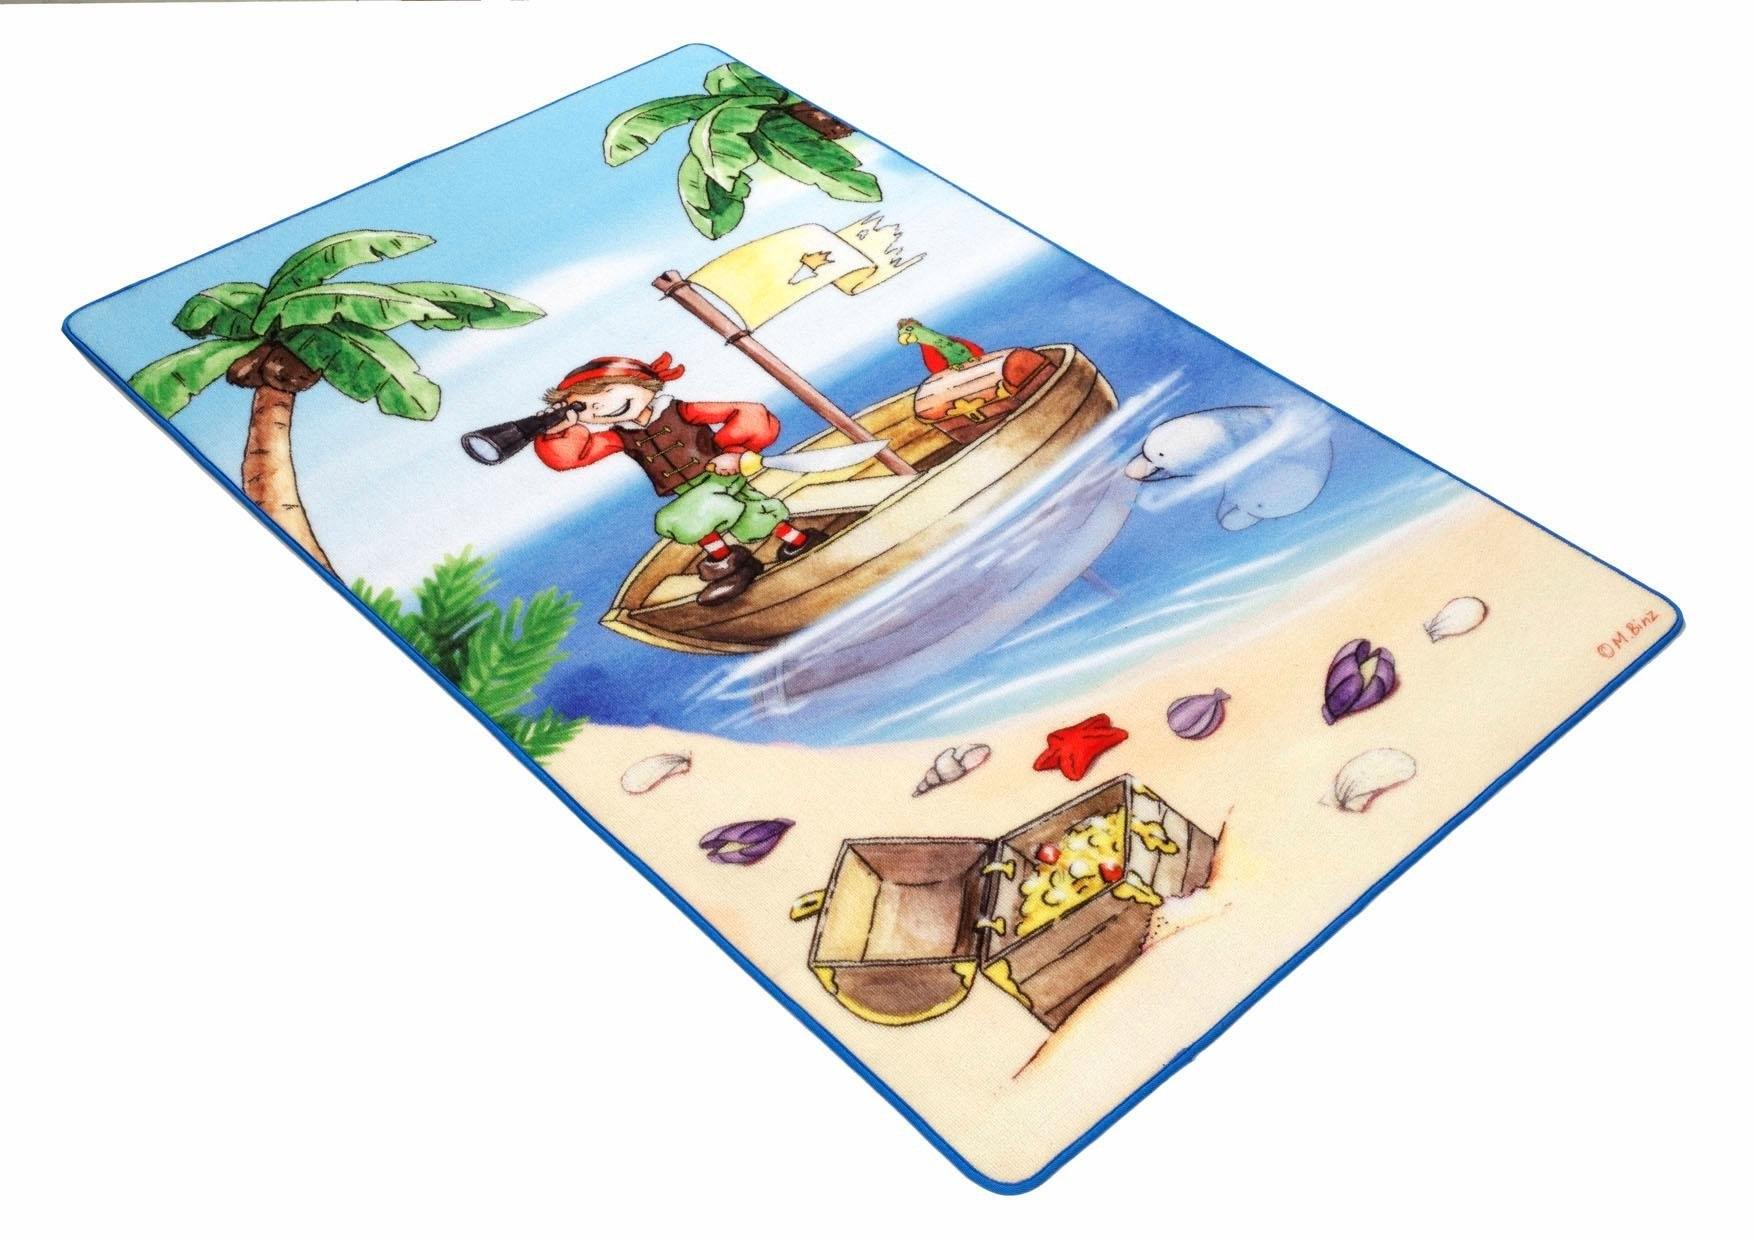 Böing Carpet Kindervloerkleed, »Lovely Kids LK-1«, rechthoekig, hoogte 2 mm veilig op otto.nl kopen